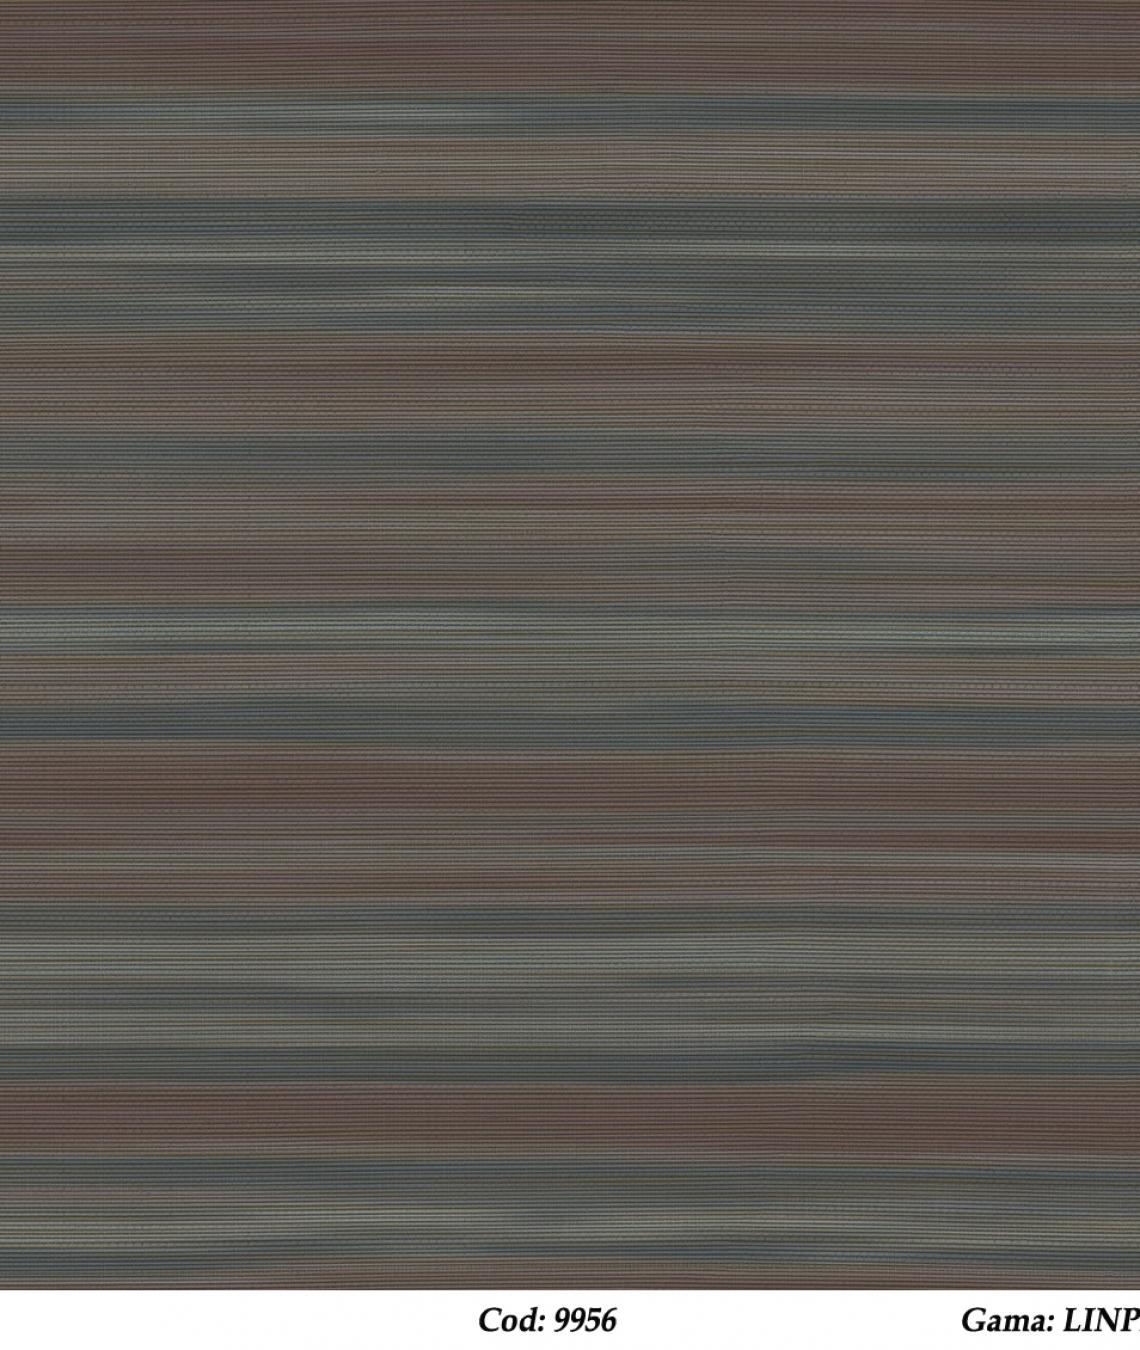 tapet-cu-dungi-orizontale-cod-9956-gama-linpha